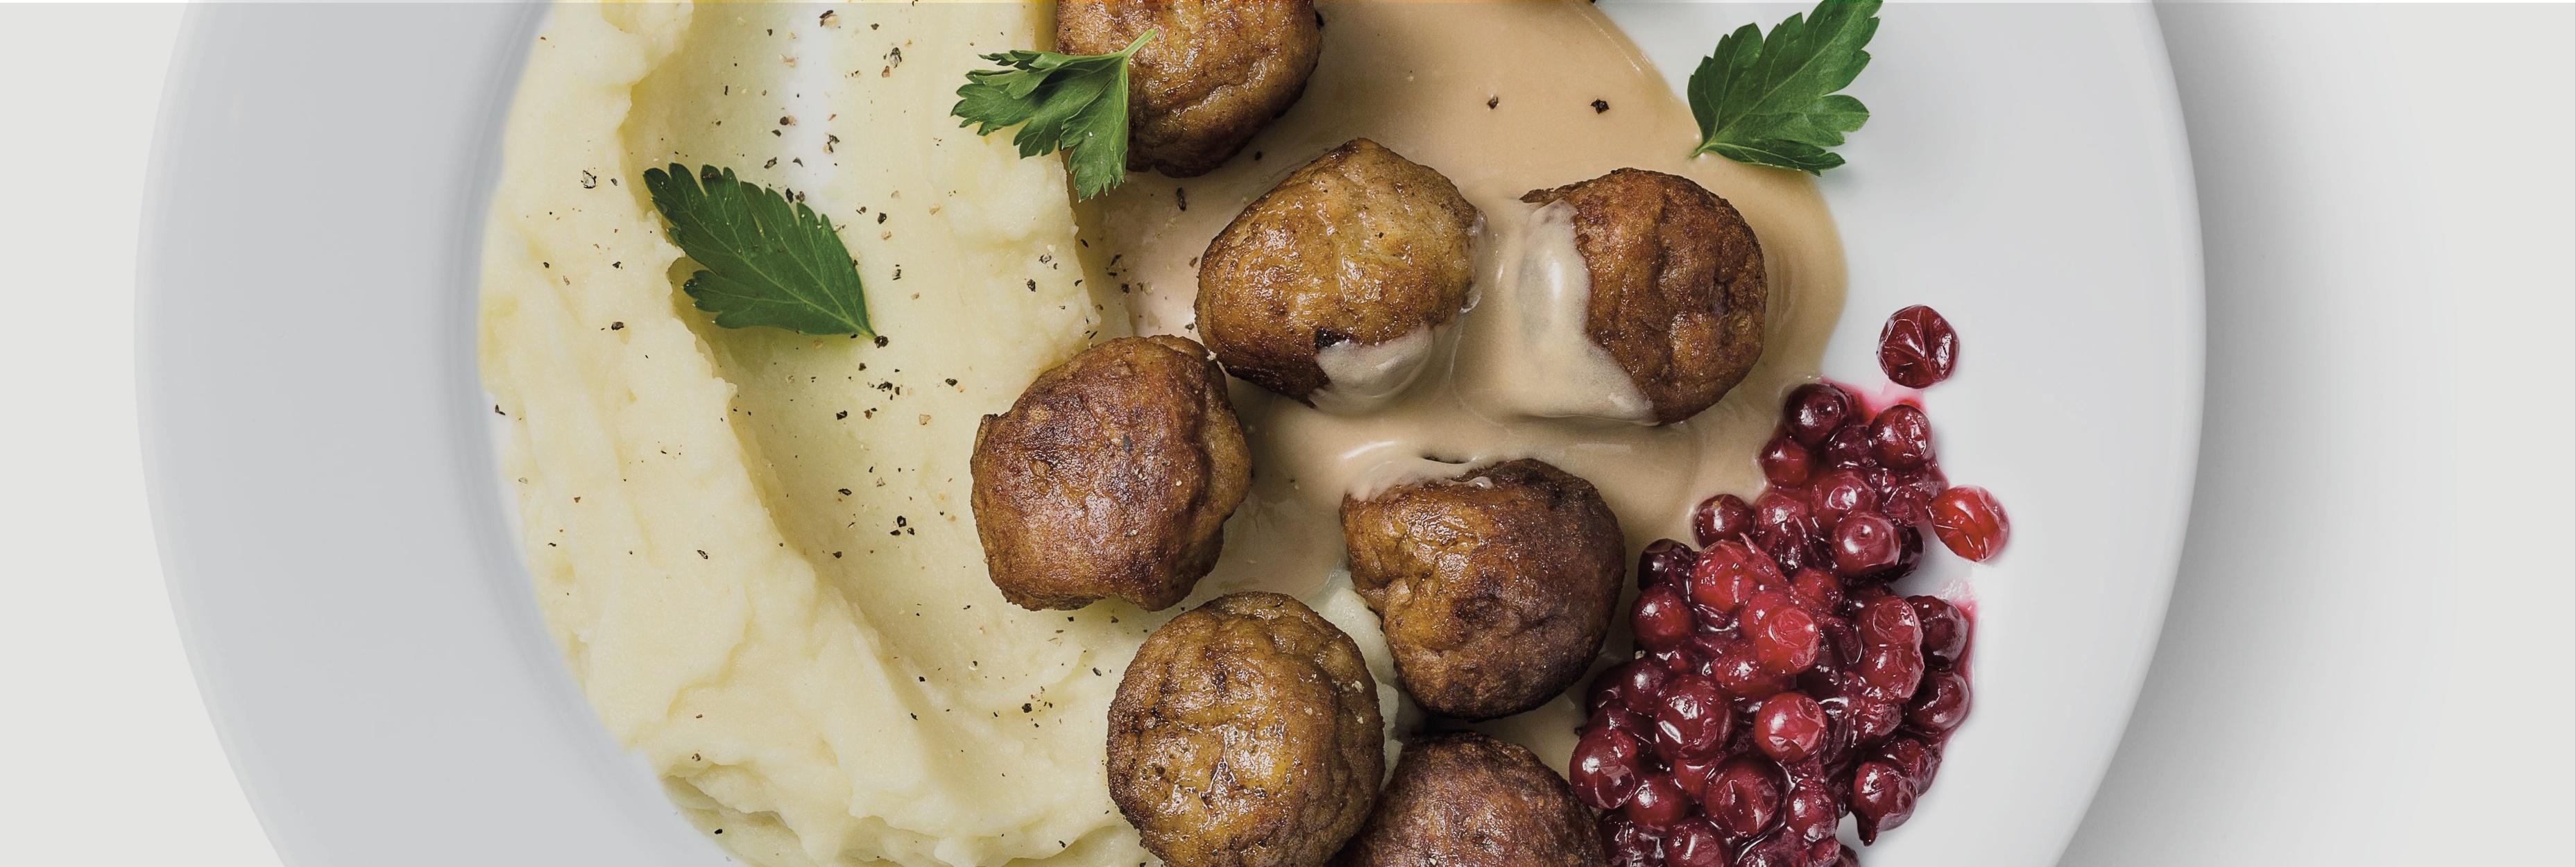 IKEA Southampton reduced food waste by 75%